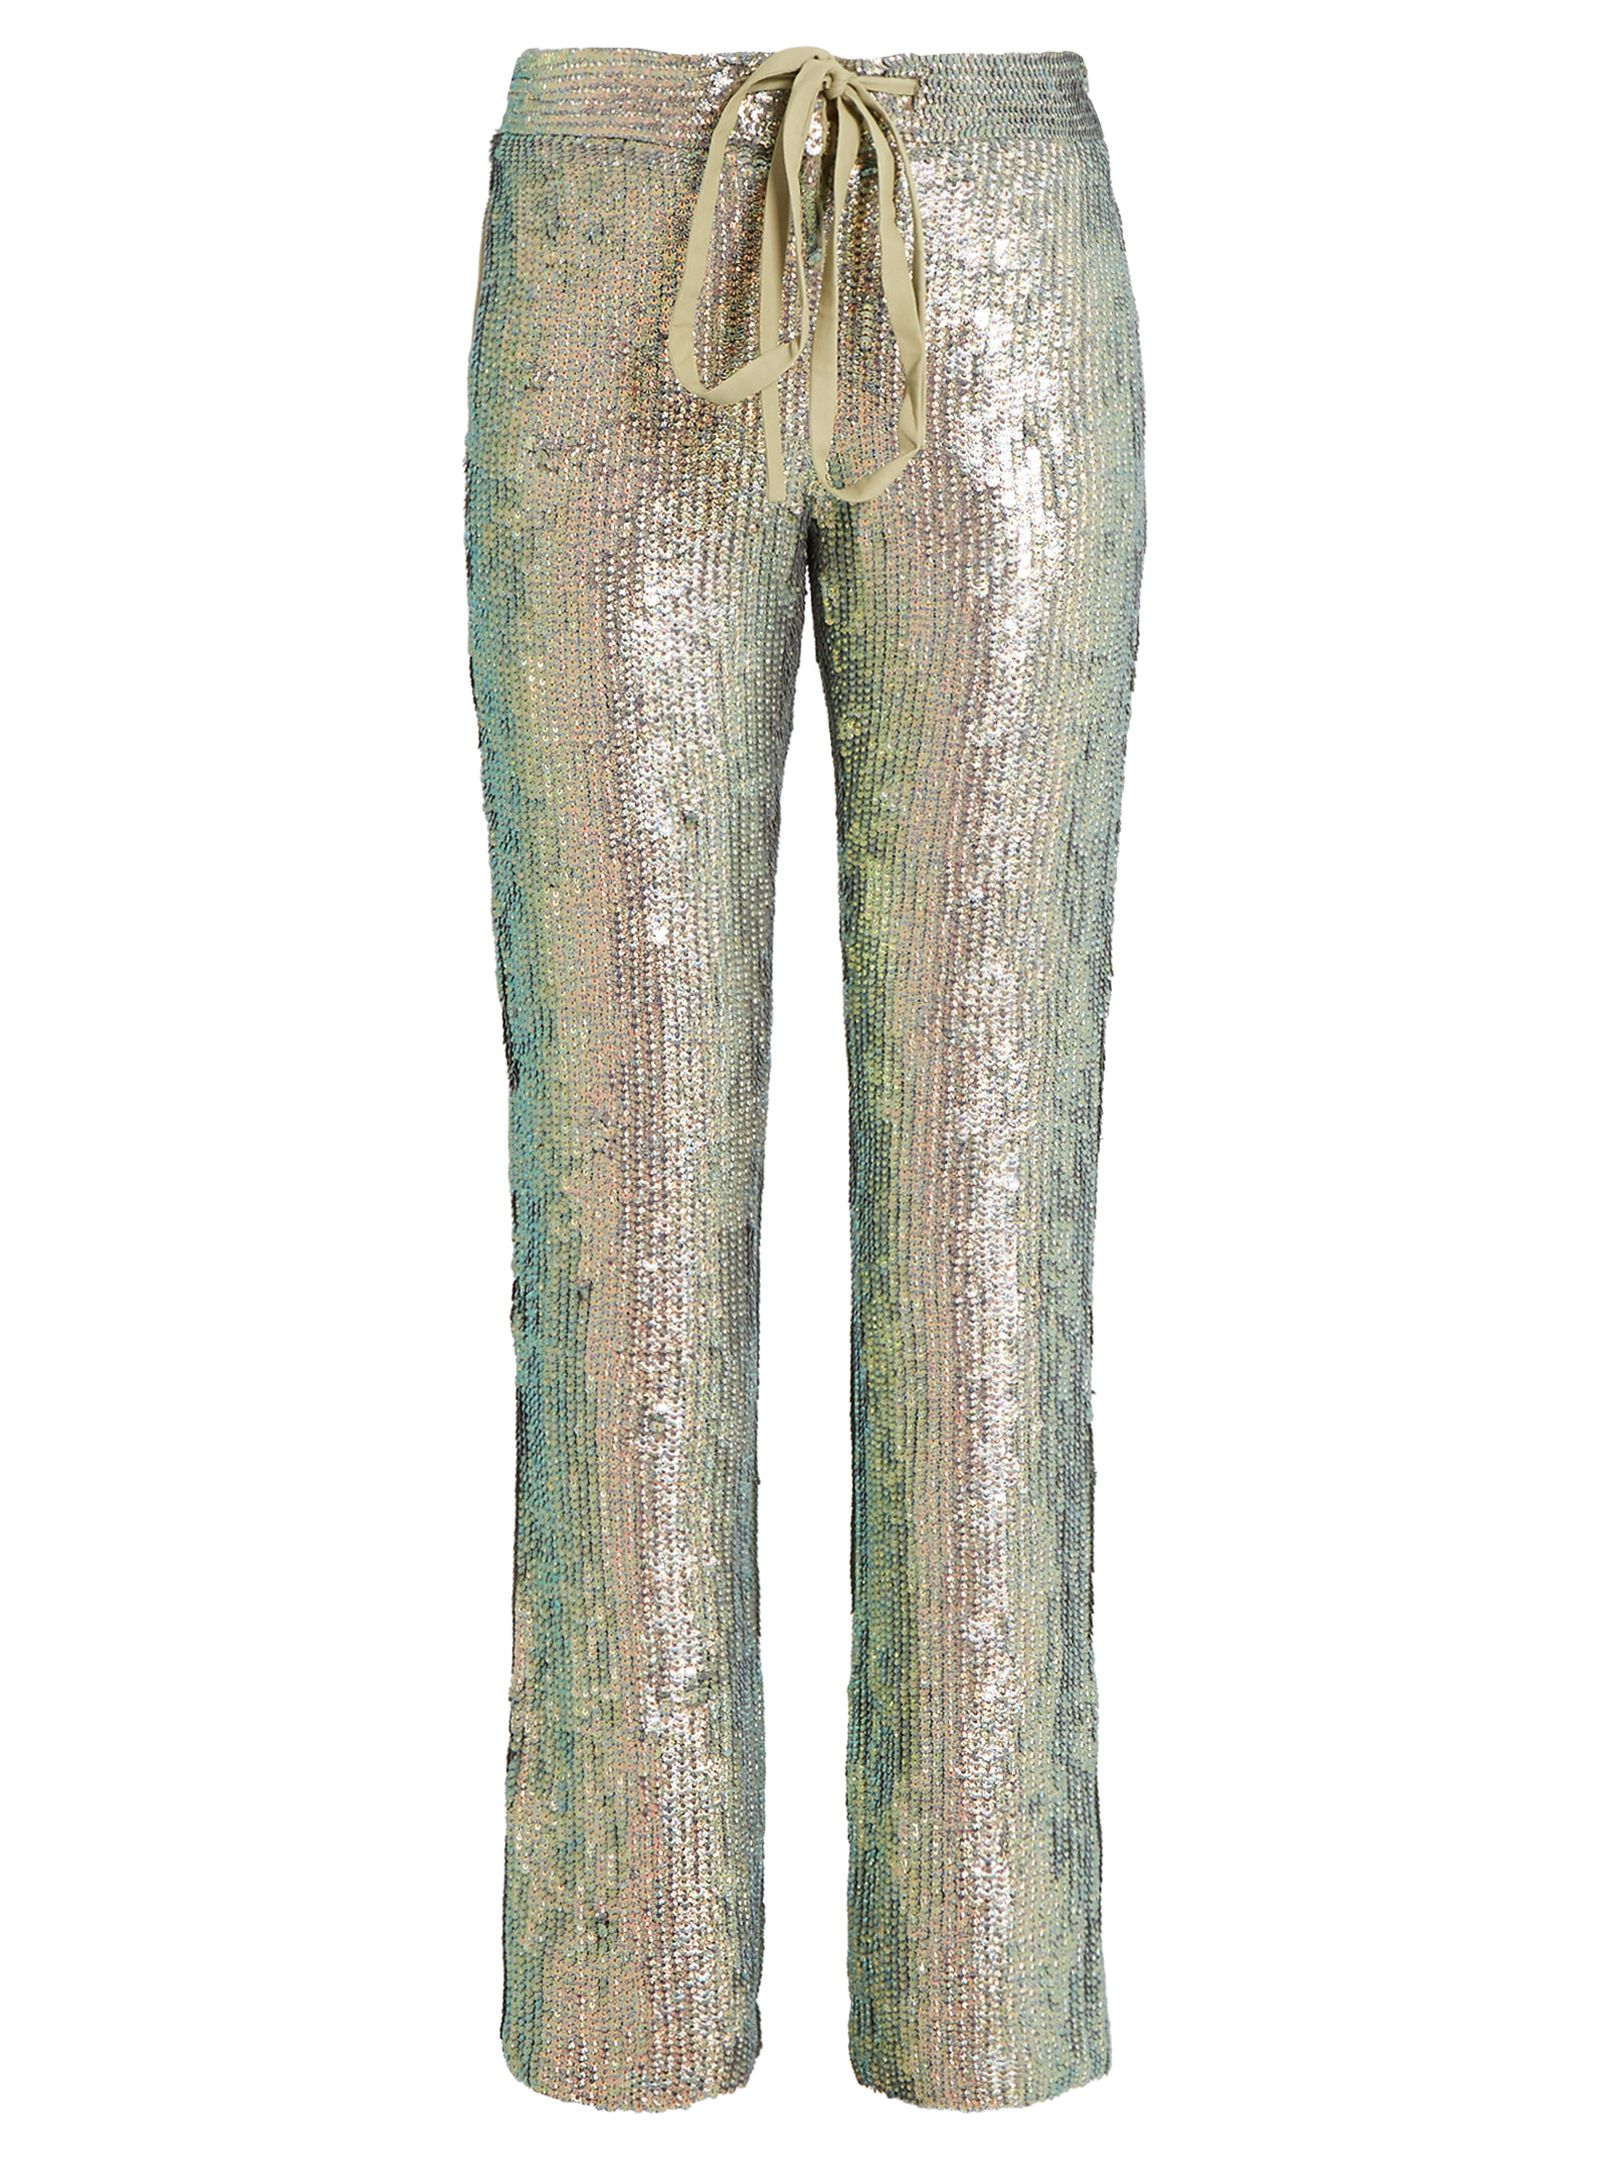 Slim-leg sequin-embellished trousers | Rosie Assoulin | MATCHESFASHION.COM AU